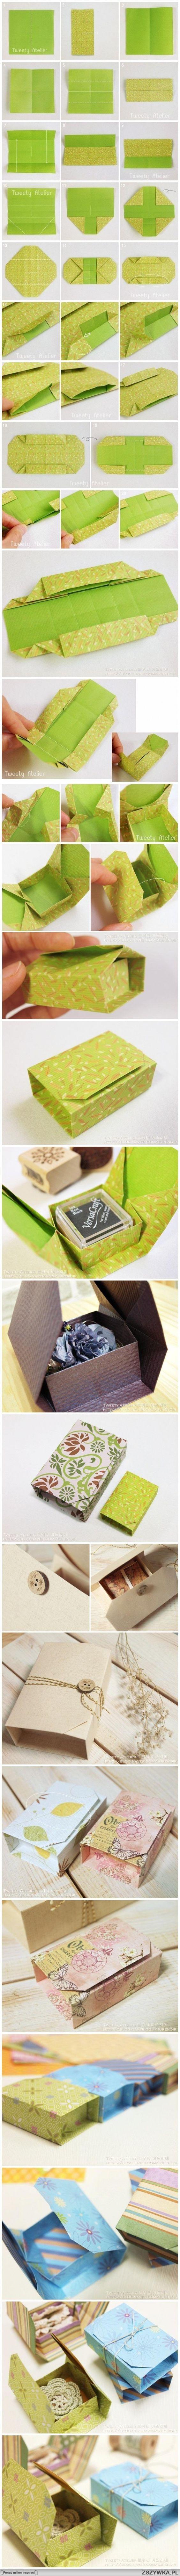 http://img.zszywka.pl/0/0160/w_8857/DIY-Zrob-to-sam/oorigamigift-box.jpg very cute!